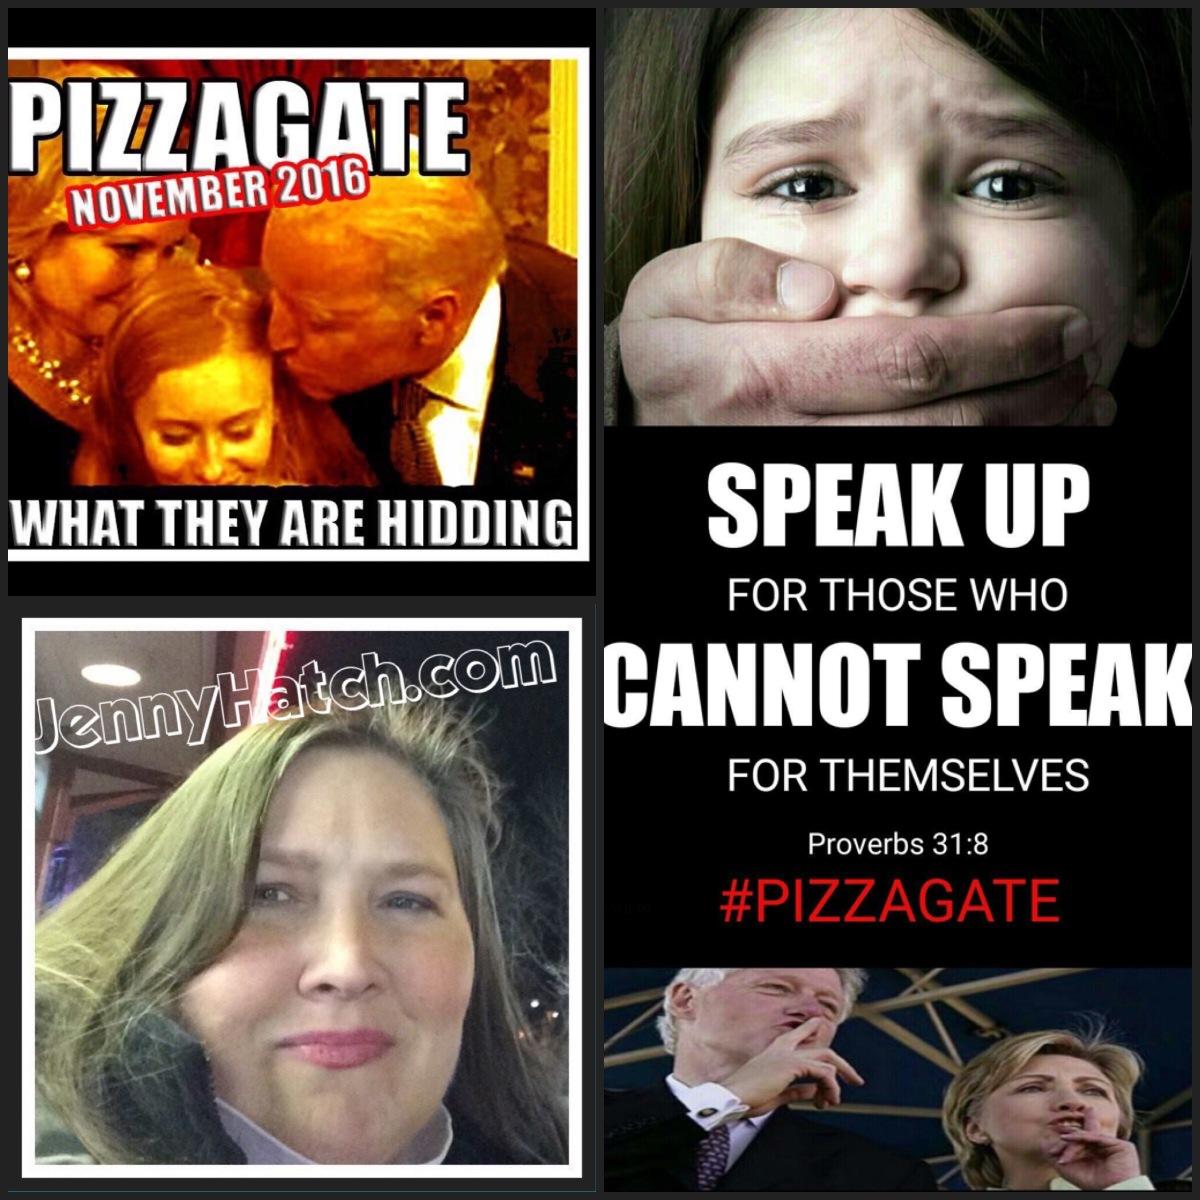 Andrew Breitbart Tweets John Podesta #Pizzagate